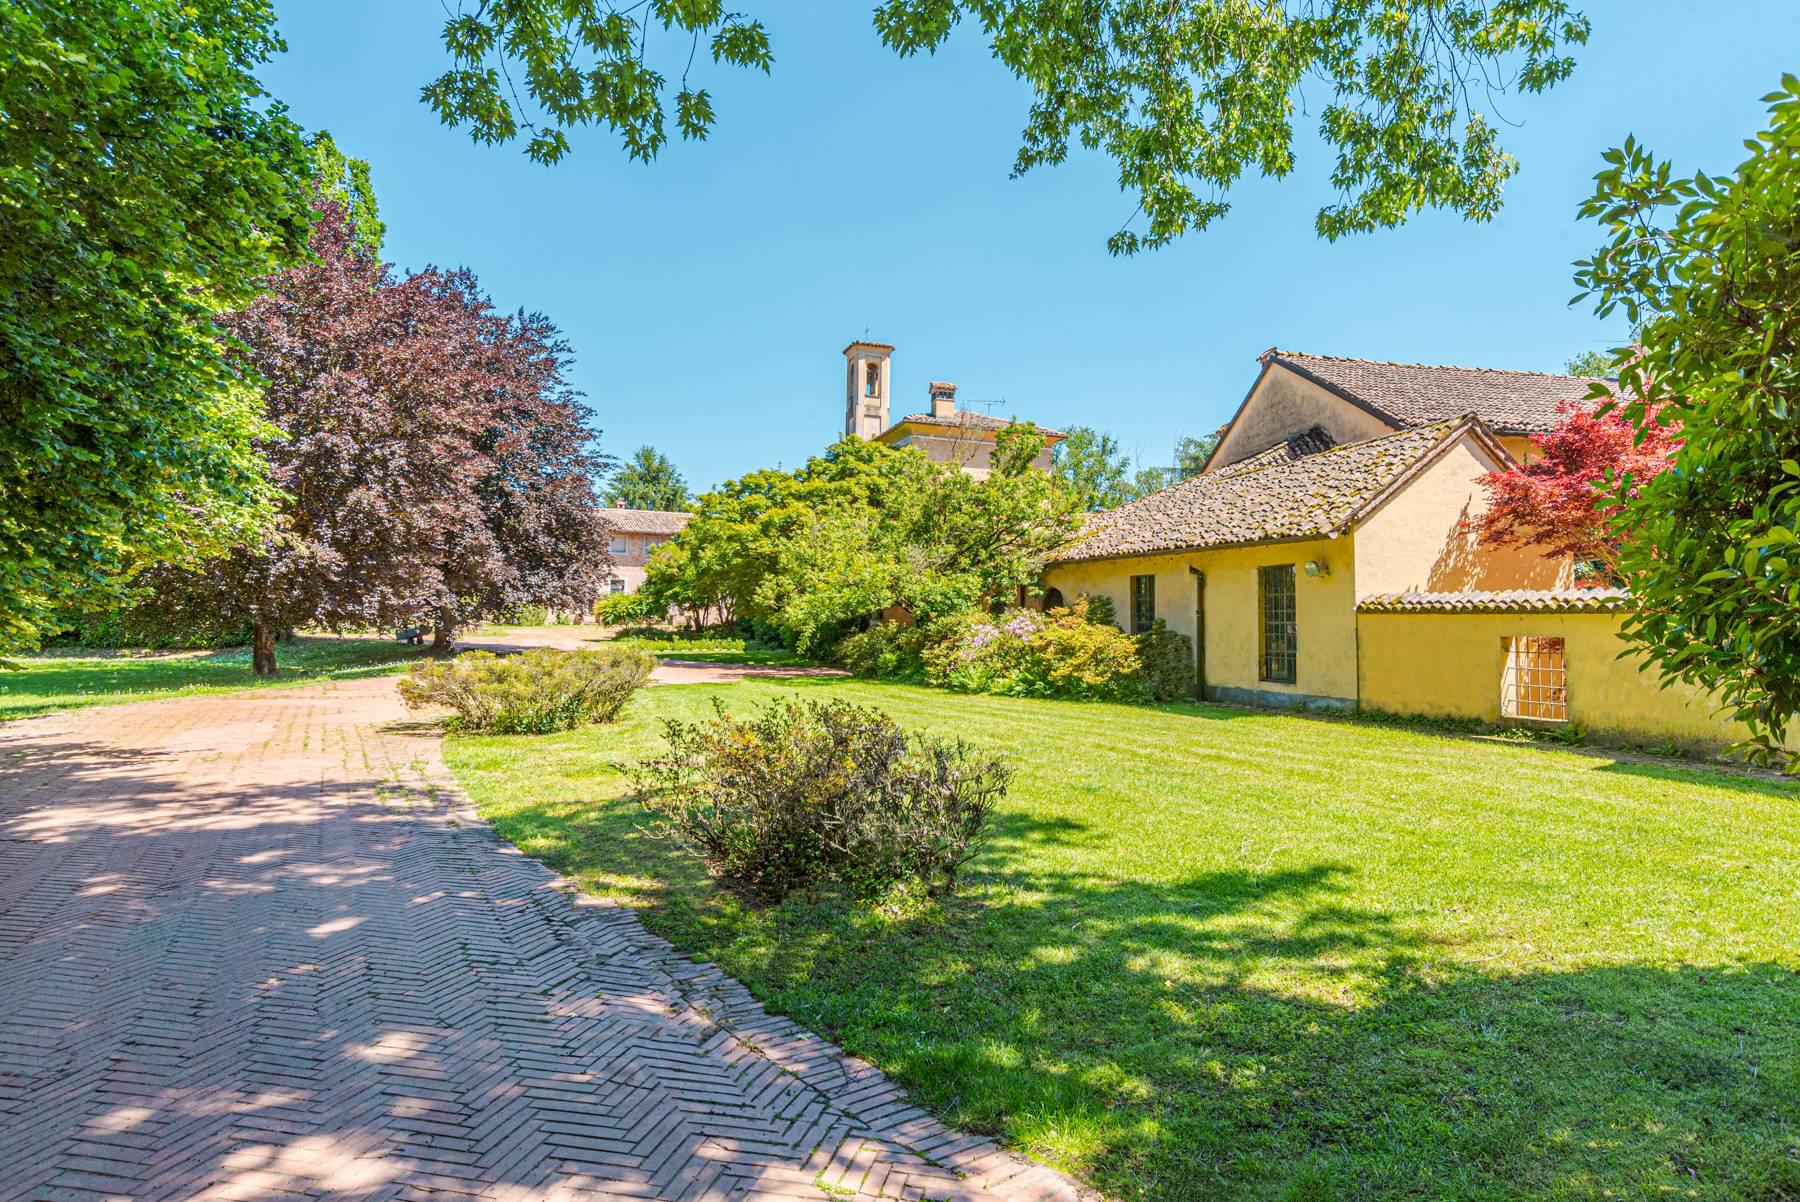 Villa in Vendita a Pavia strada sora